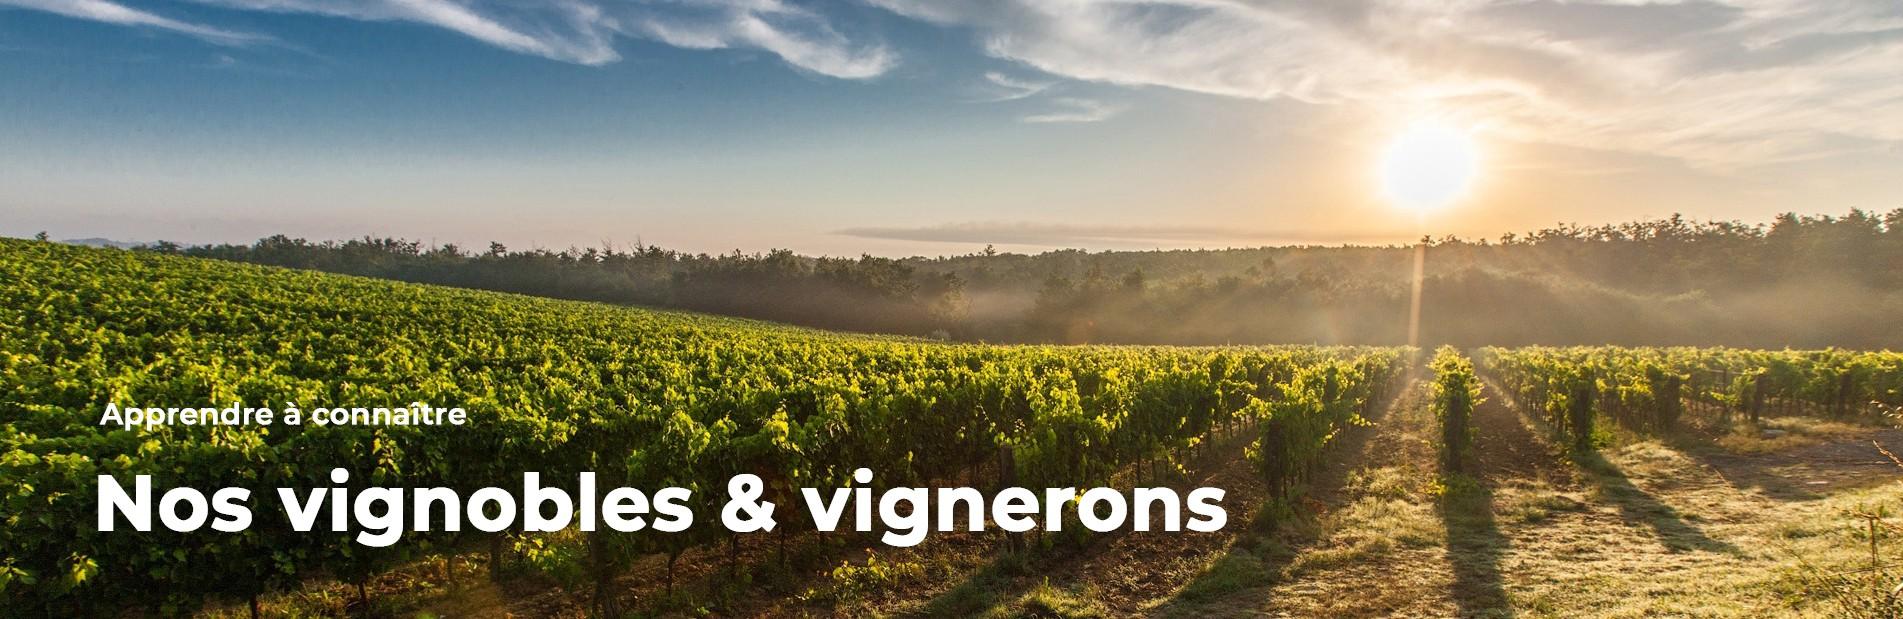 Nos vignobles & vignerons